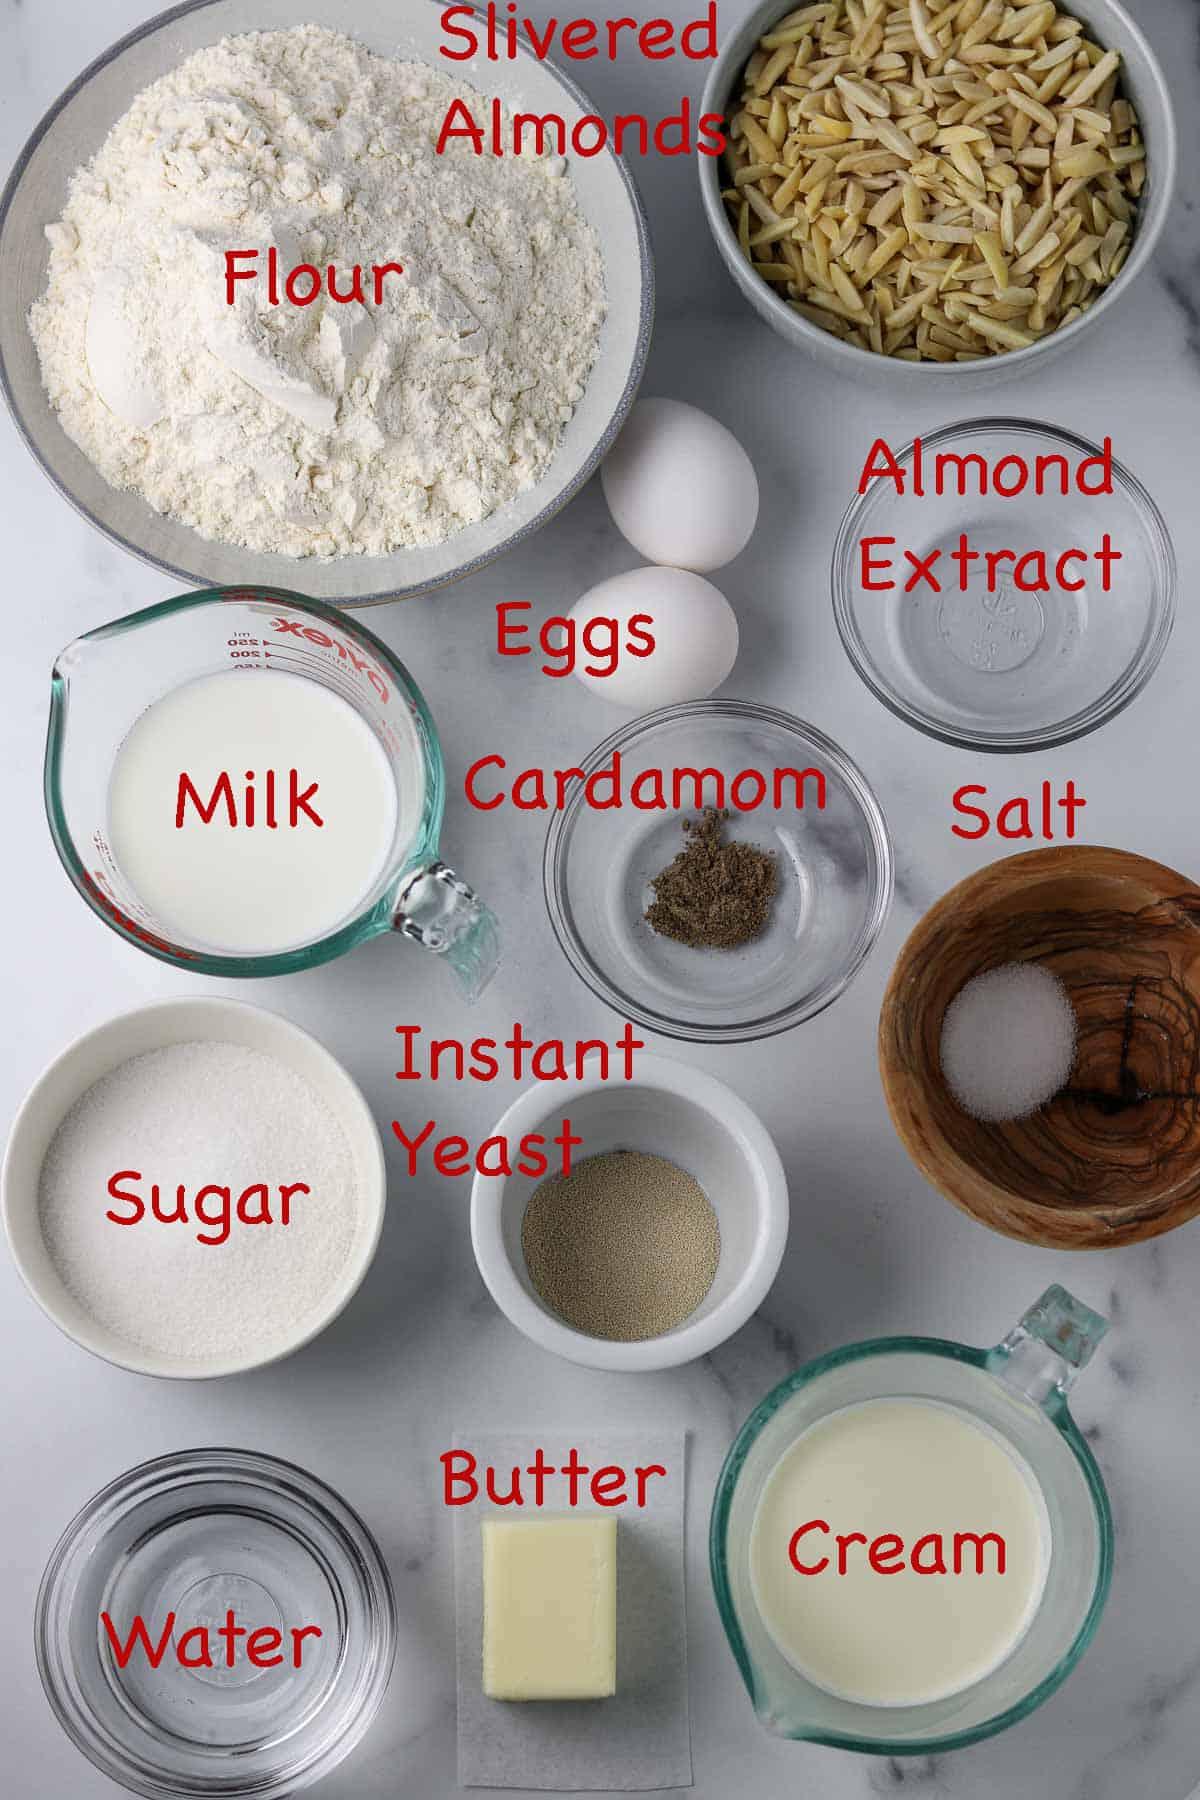 Labeled ingredients for semlor.